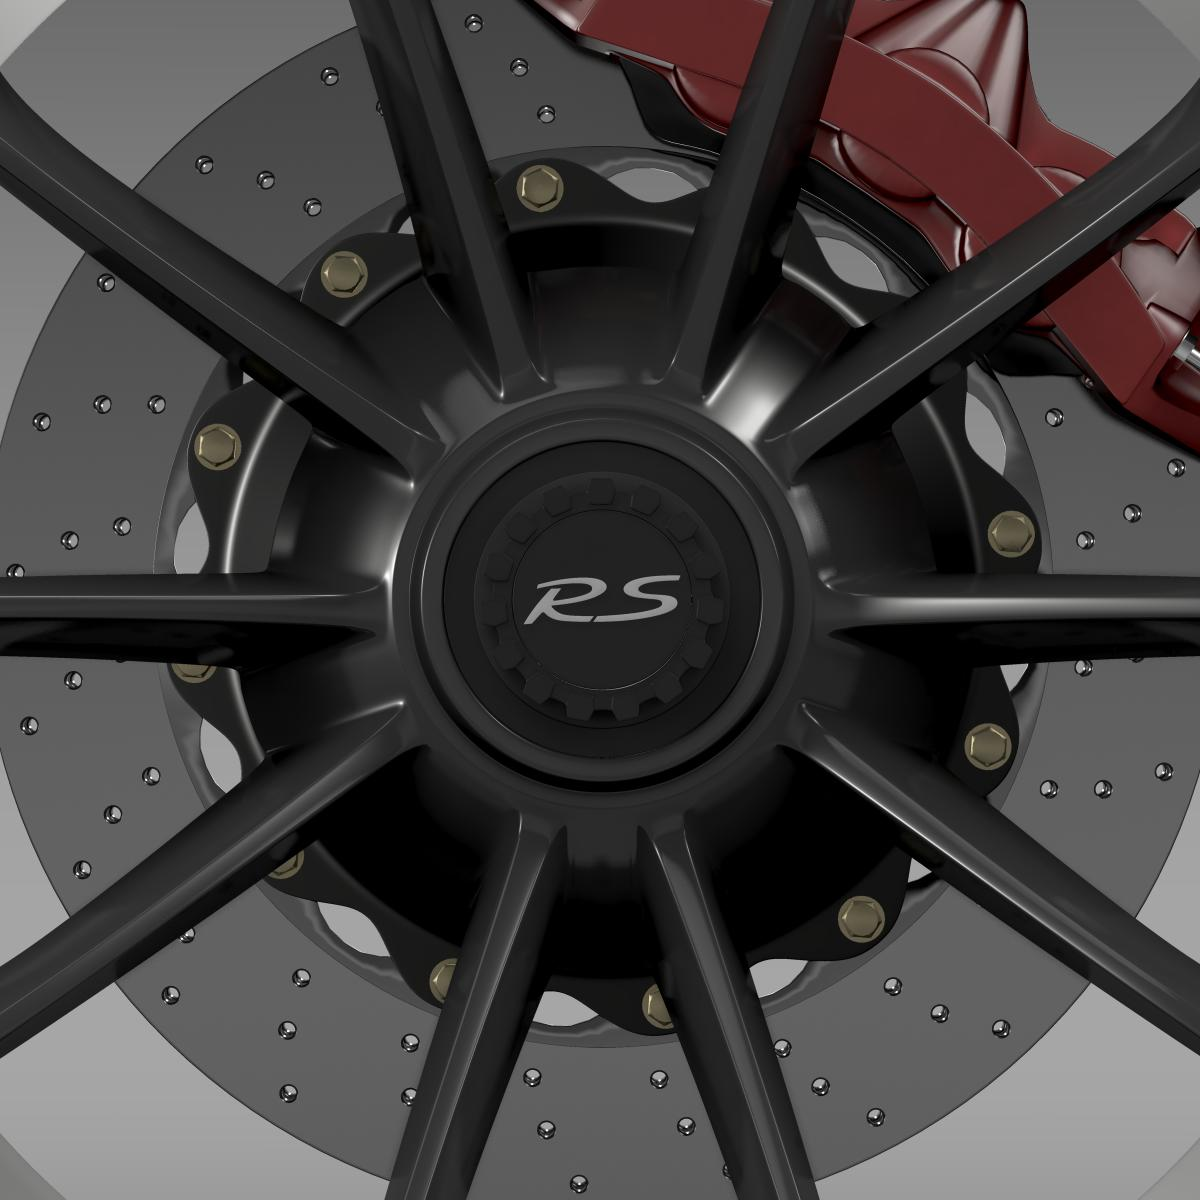 porsche 911 gt3 rs 2015 wheel 3d model 3ds max fbx c4d lwo ma mb hrc xsi obj 210832